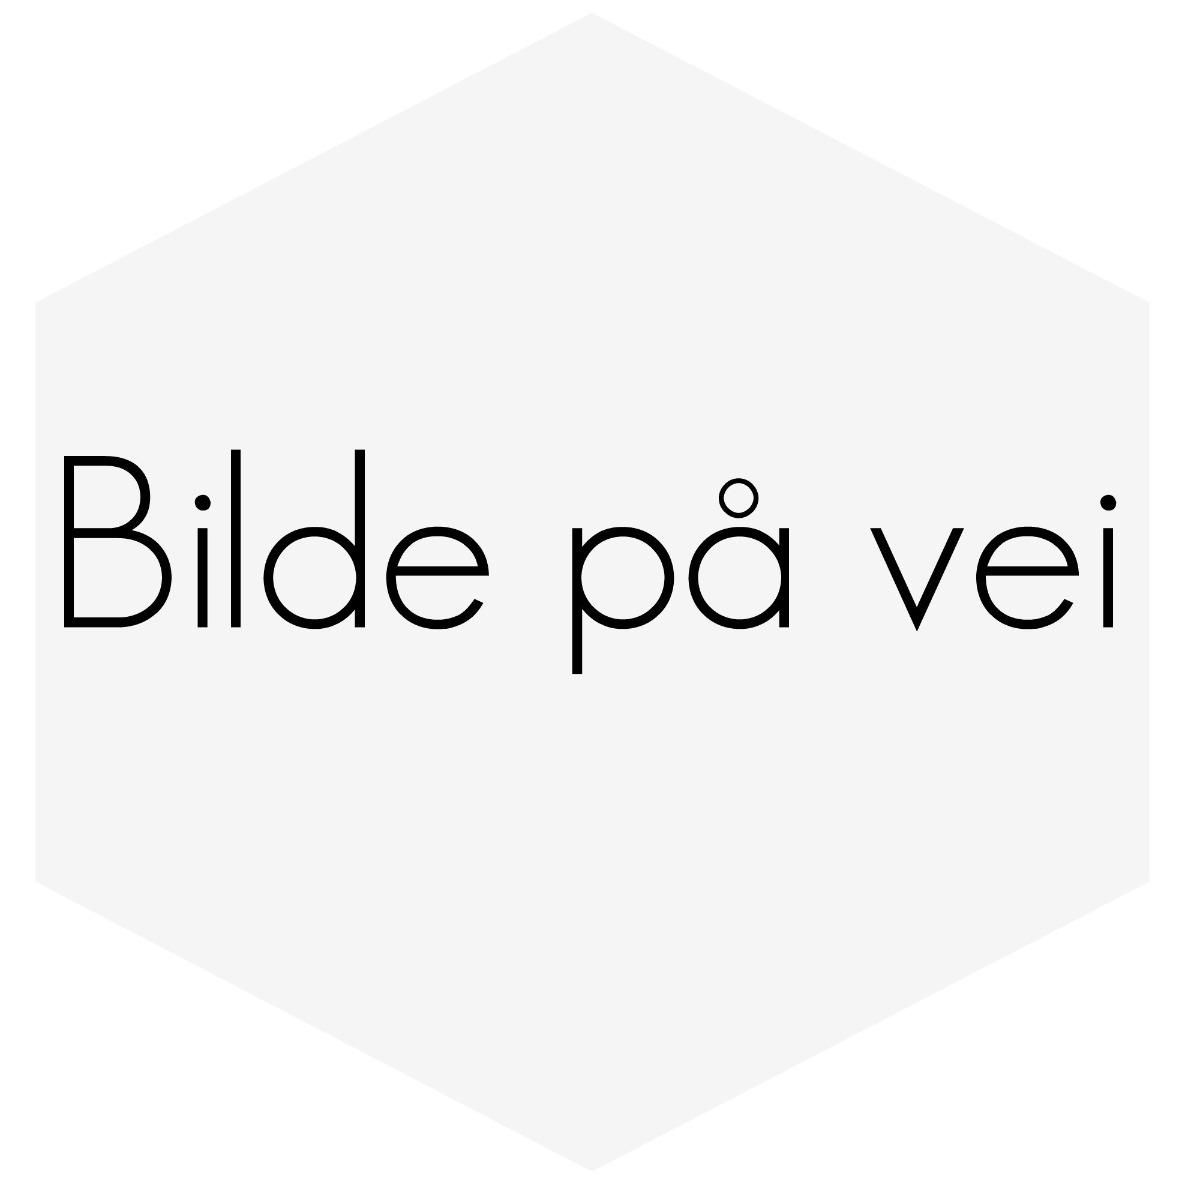 INSTRUMENT PROSPORT-S 60MM OLJETRYKKS MÅLER MED LYDVARSLER